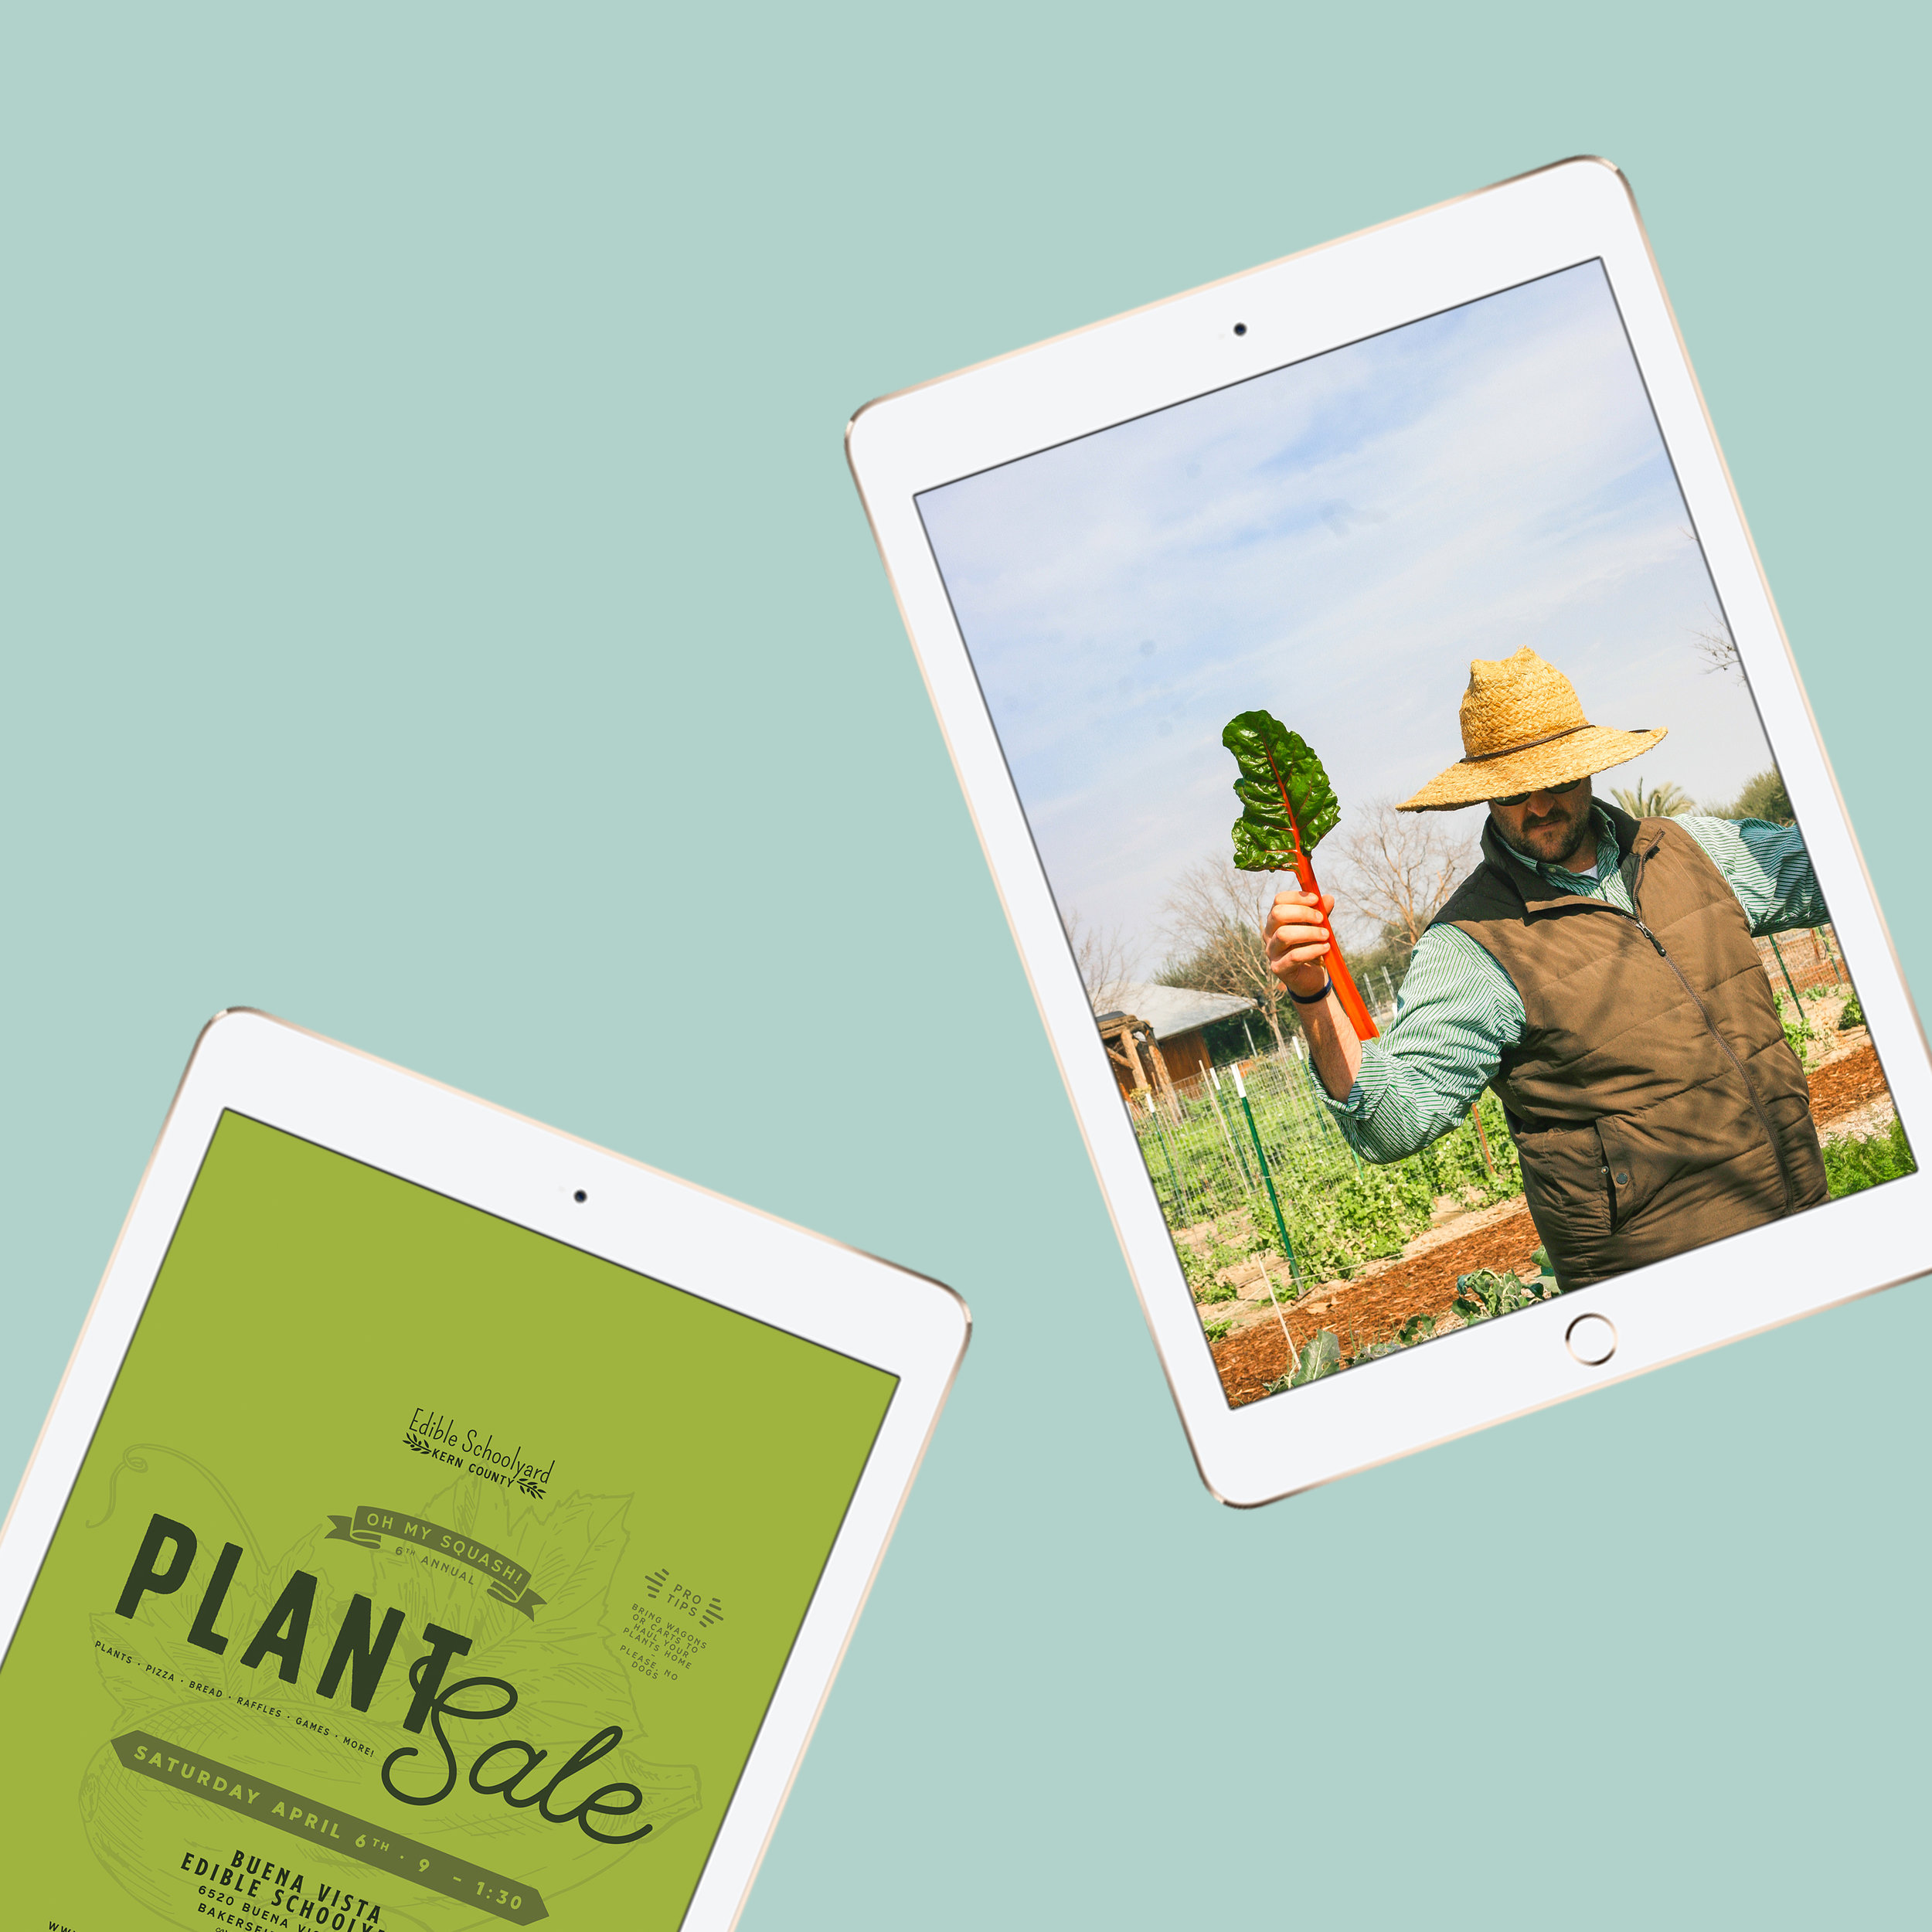 Edible-Schoolyard-Kern-County-Promotion_Website_2.jpg